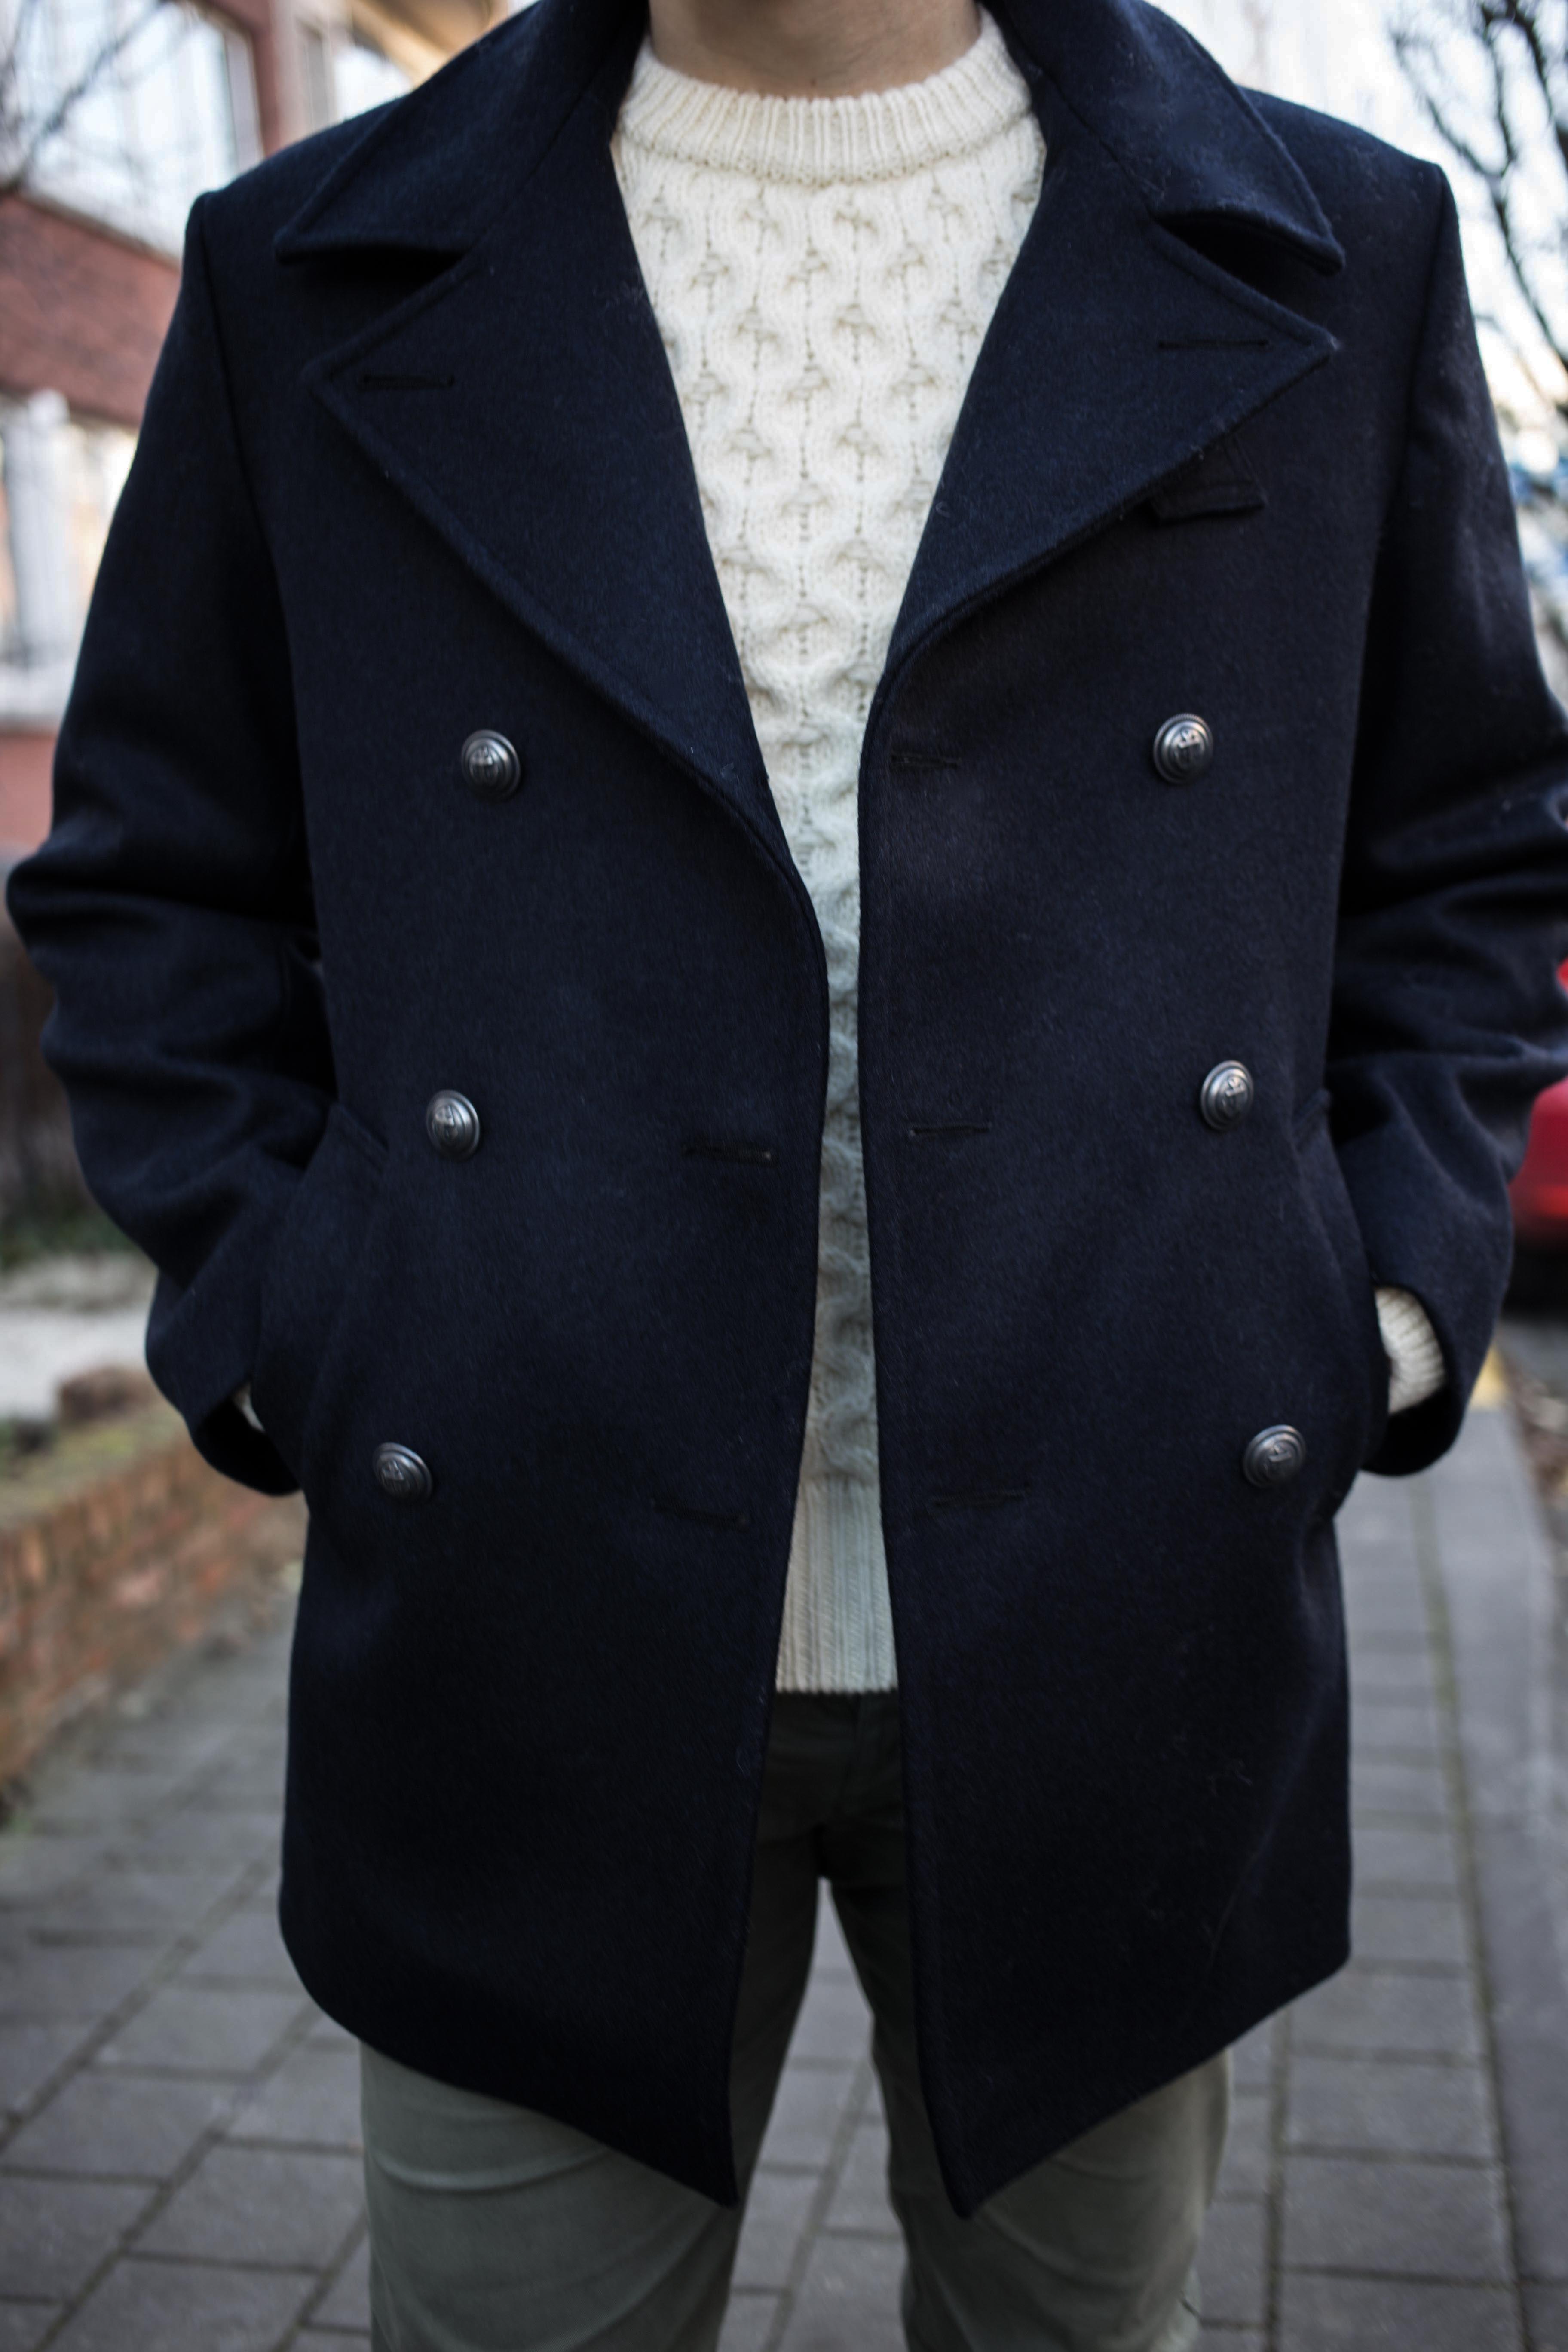 bretonische-cabanjacke-pea-coat-maritimer-look-zweireihige-jacke-beiger-strickpulli-graue-lederstiefel_0091